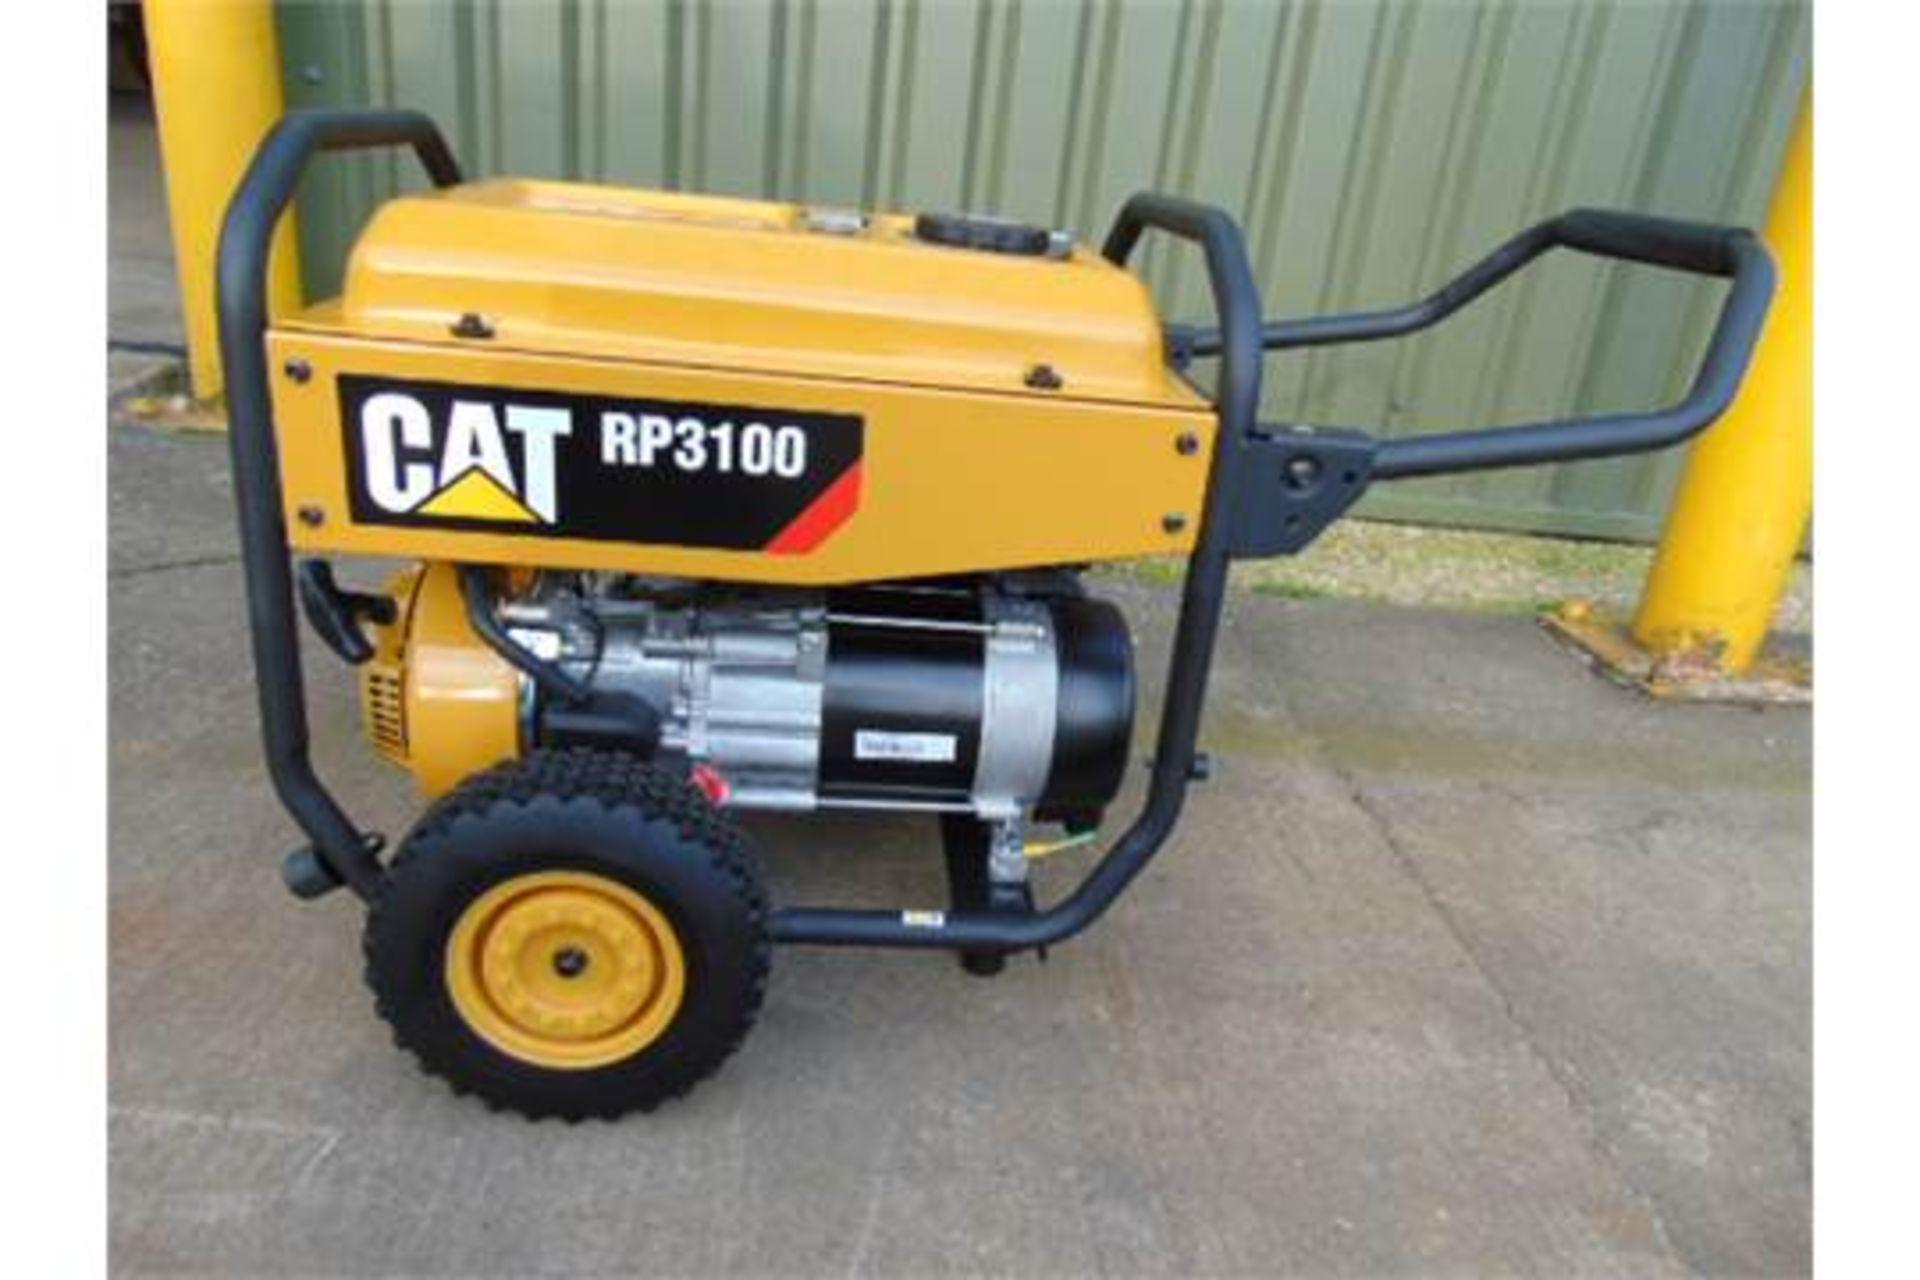 Lot 25 - UNISSUED Caterpillar RP3100 industrial Petrol Generator Set